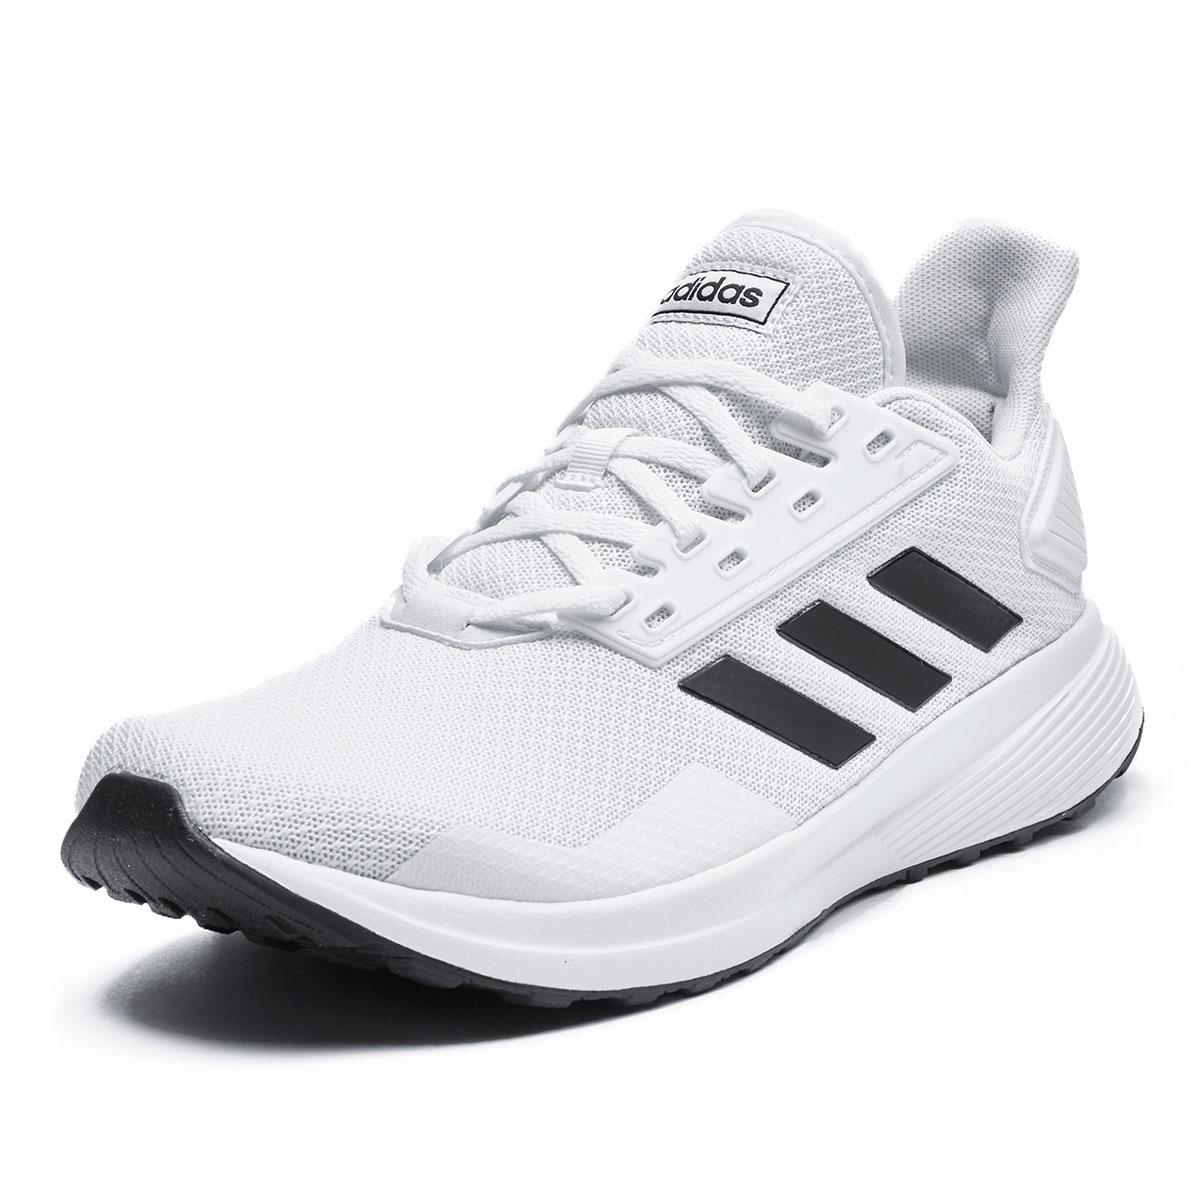 c5a84f5e596 Оригинални Мъжки Маратонки Adidas Duramo 9 white - ShopSector.com